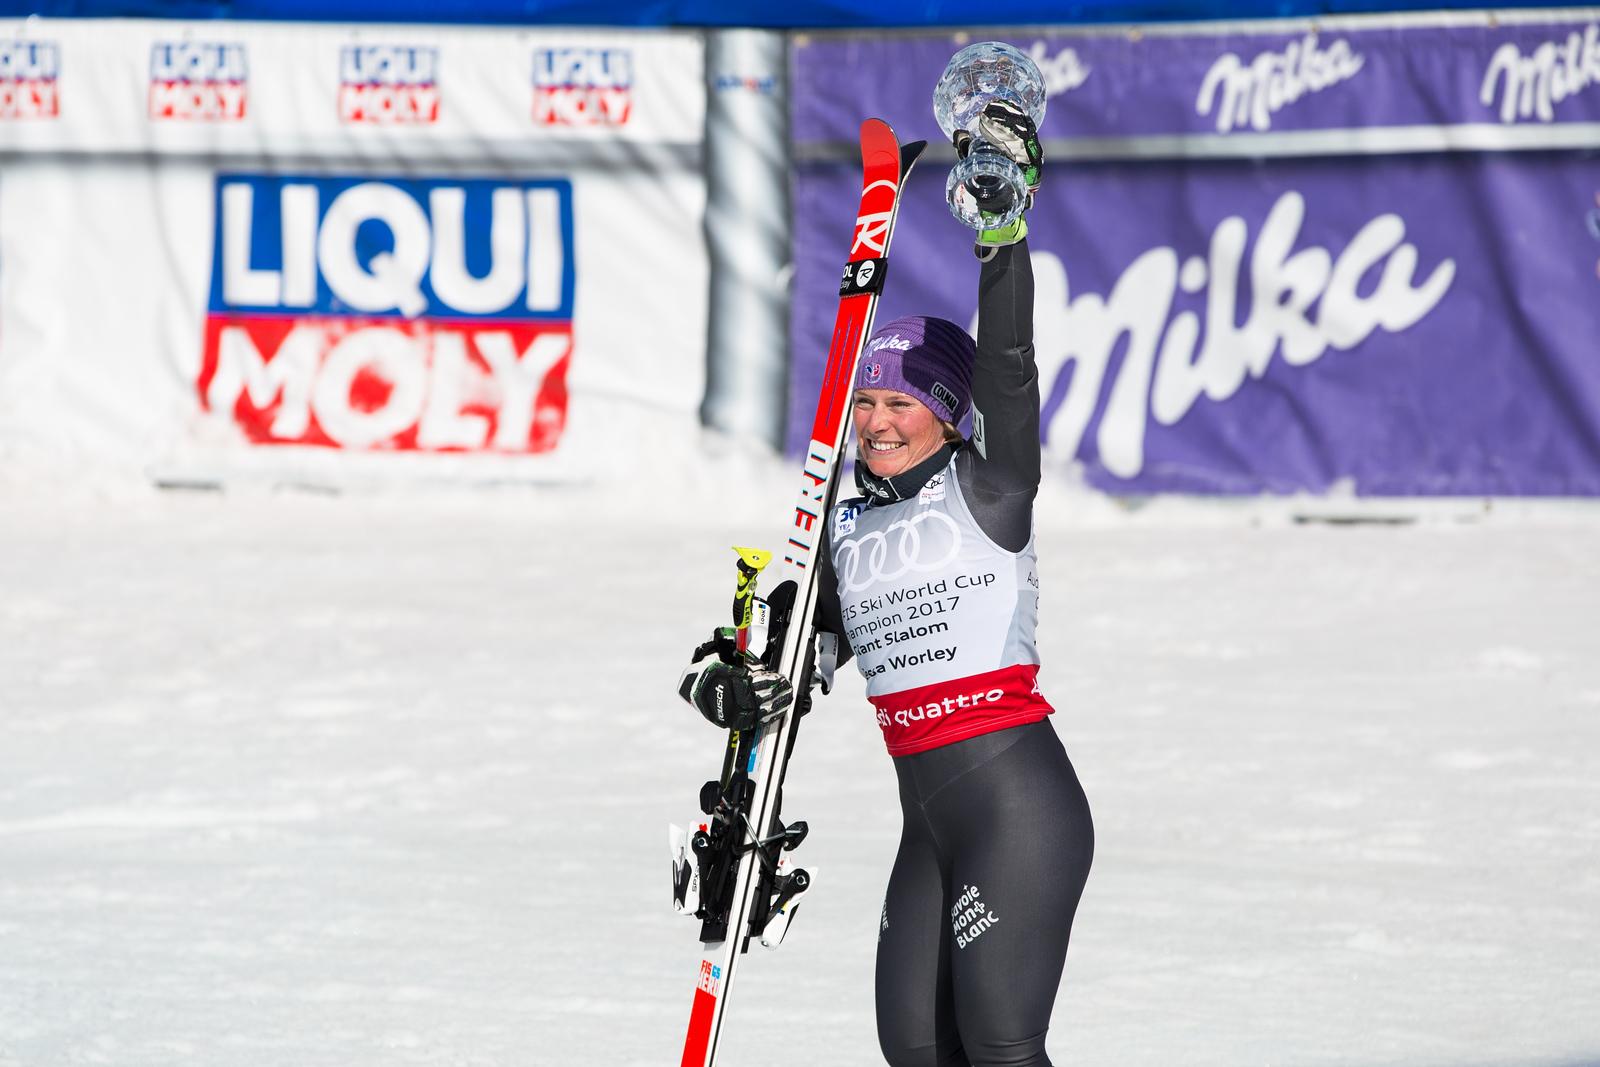 Tessa Worley GS 2017 Audi FIS Ski World Cup finals in Aspen, CO. Photo: U.S. Ski Team